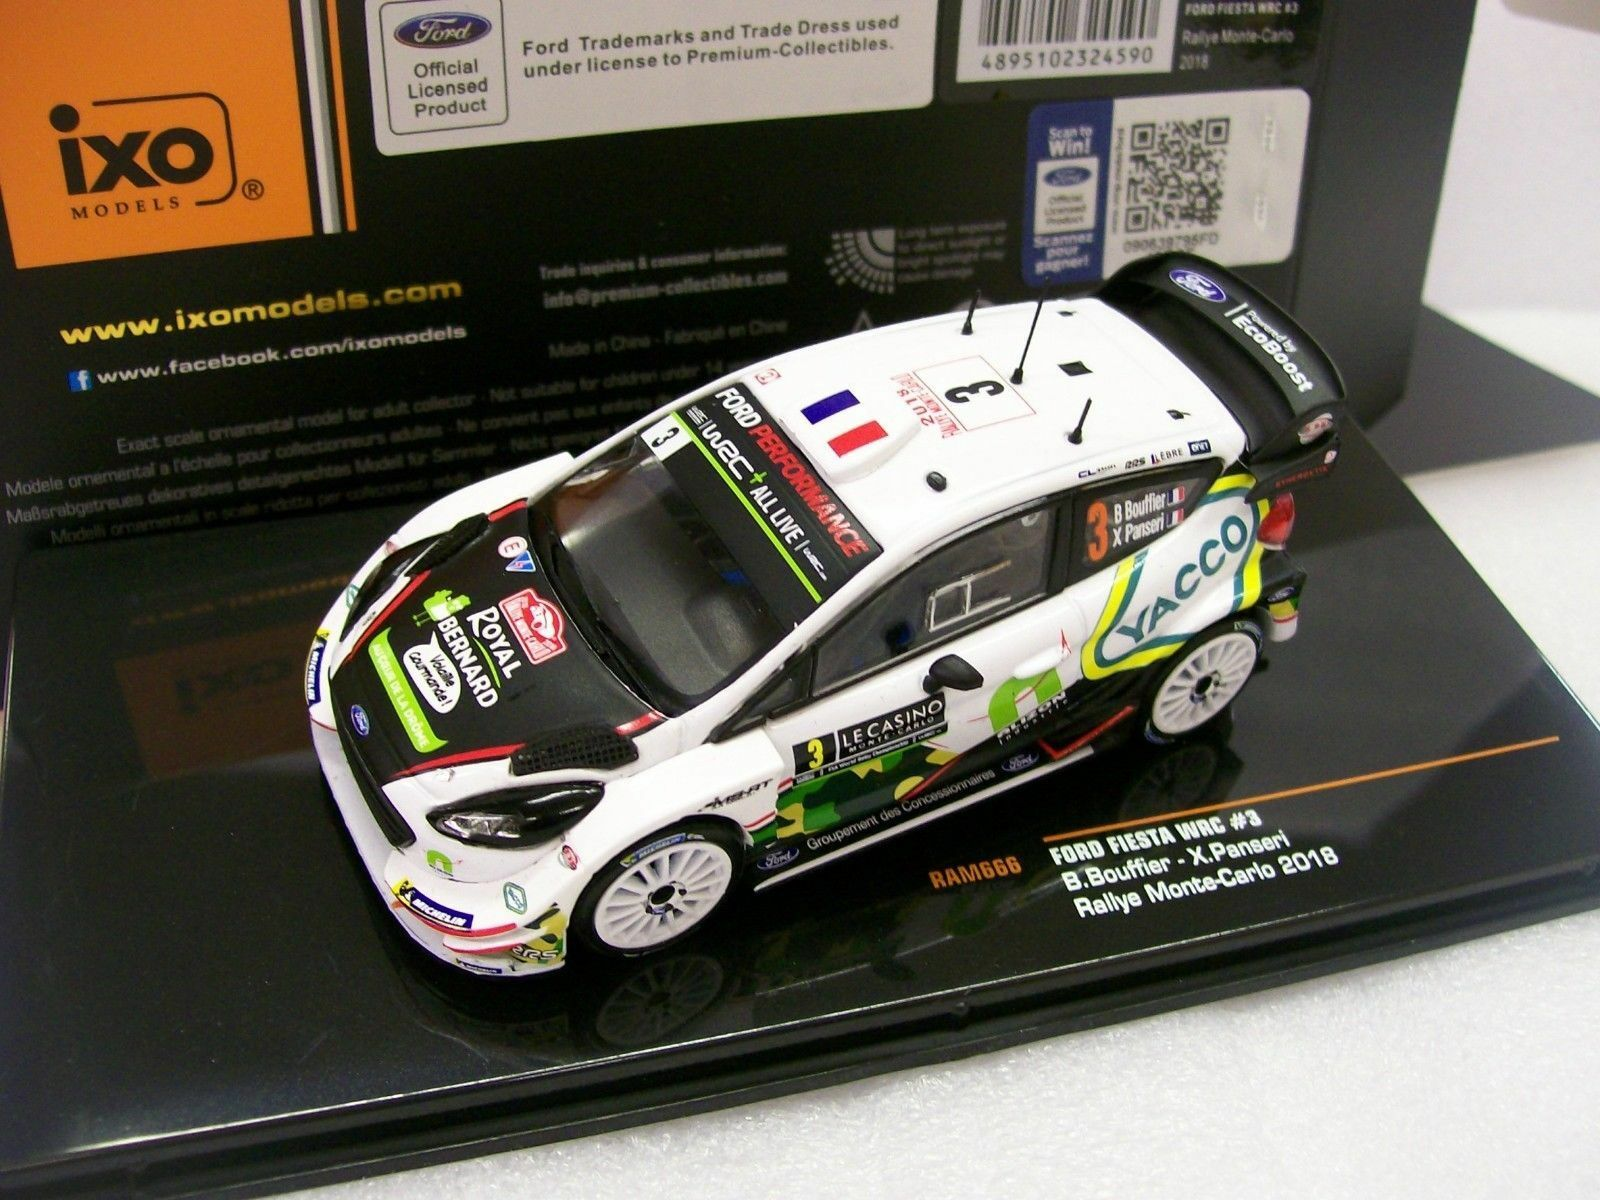 Ford Fiesta WRC 17 RS RALLY MOUNTED CARLO 2018 Bouffier 1 43 IXO